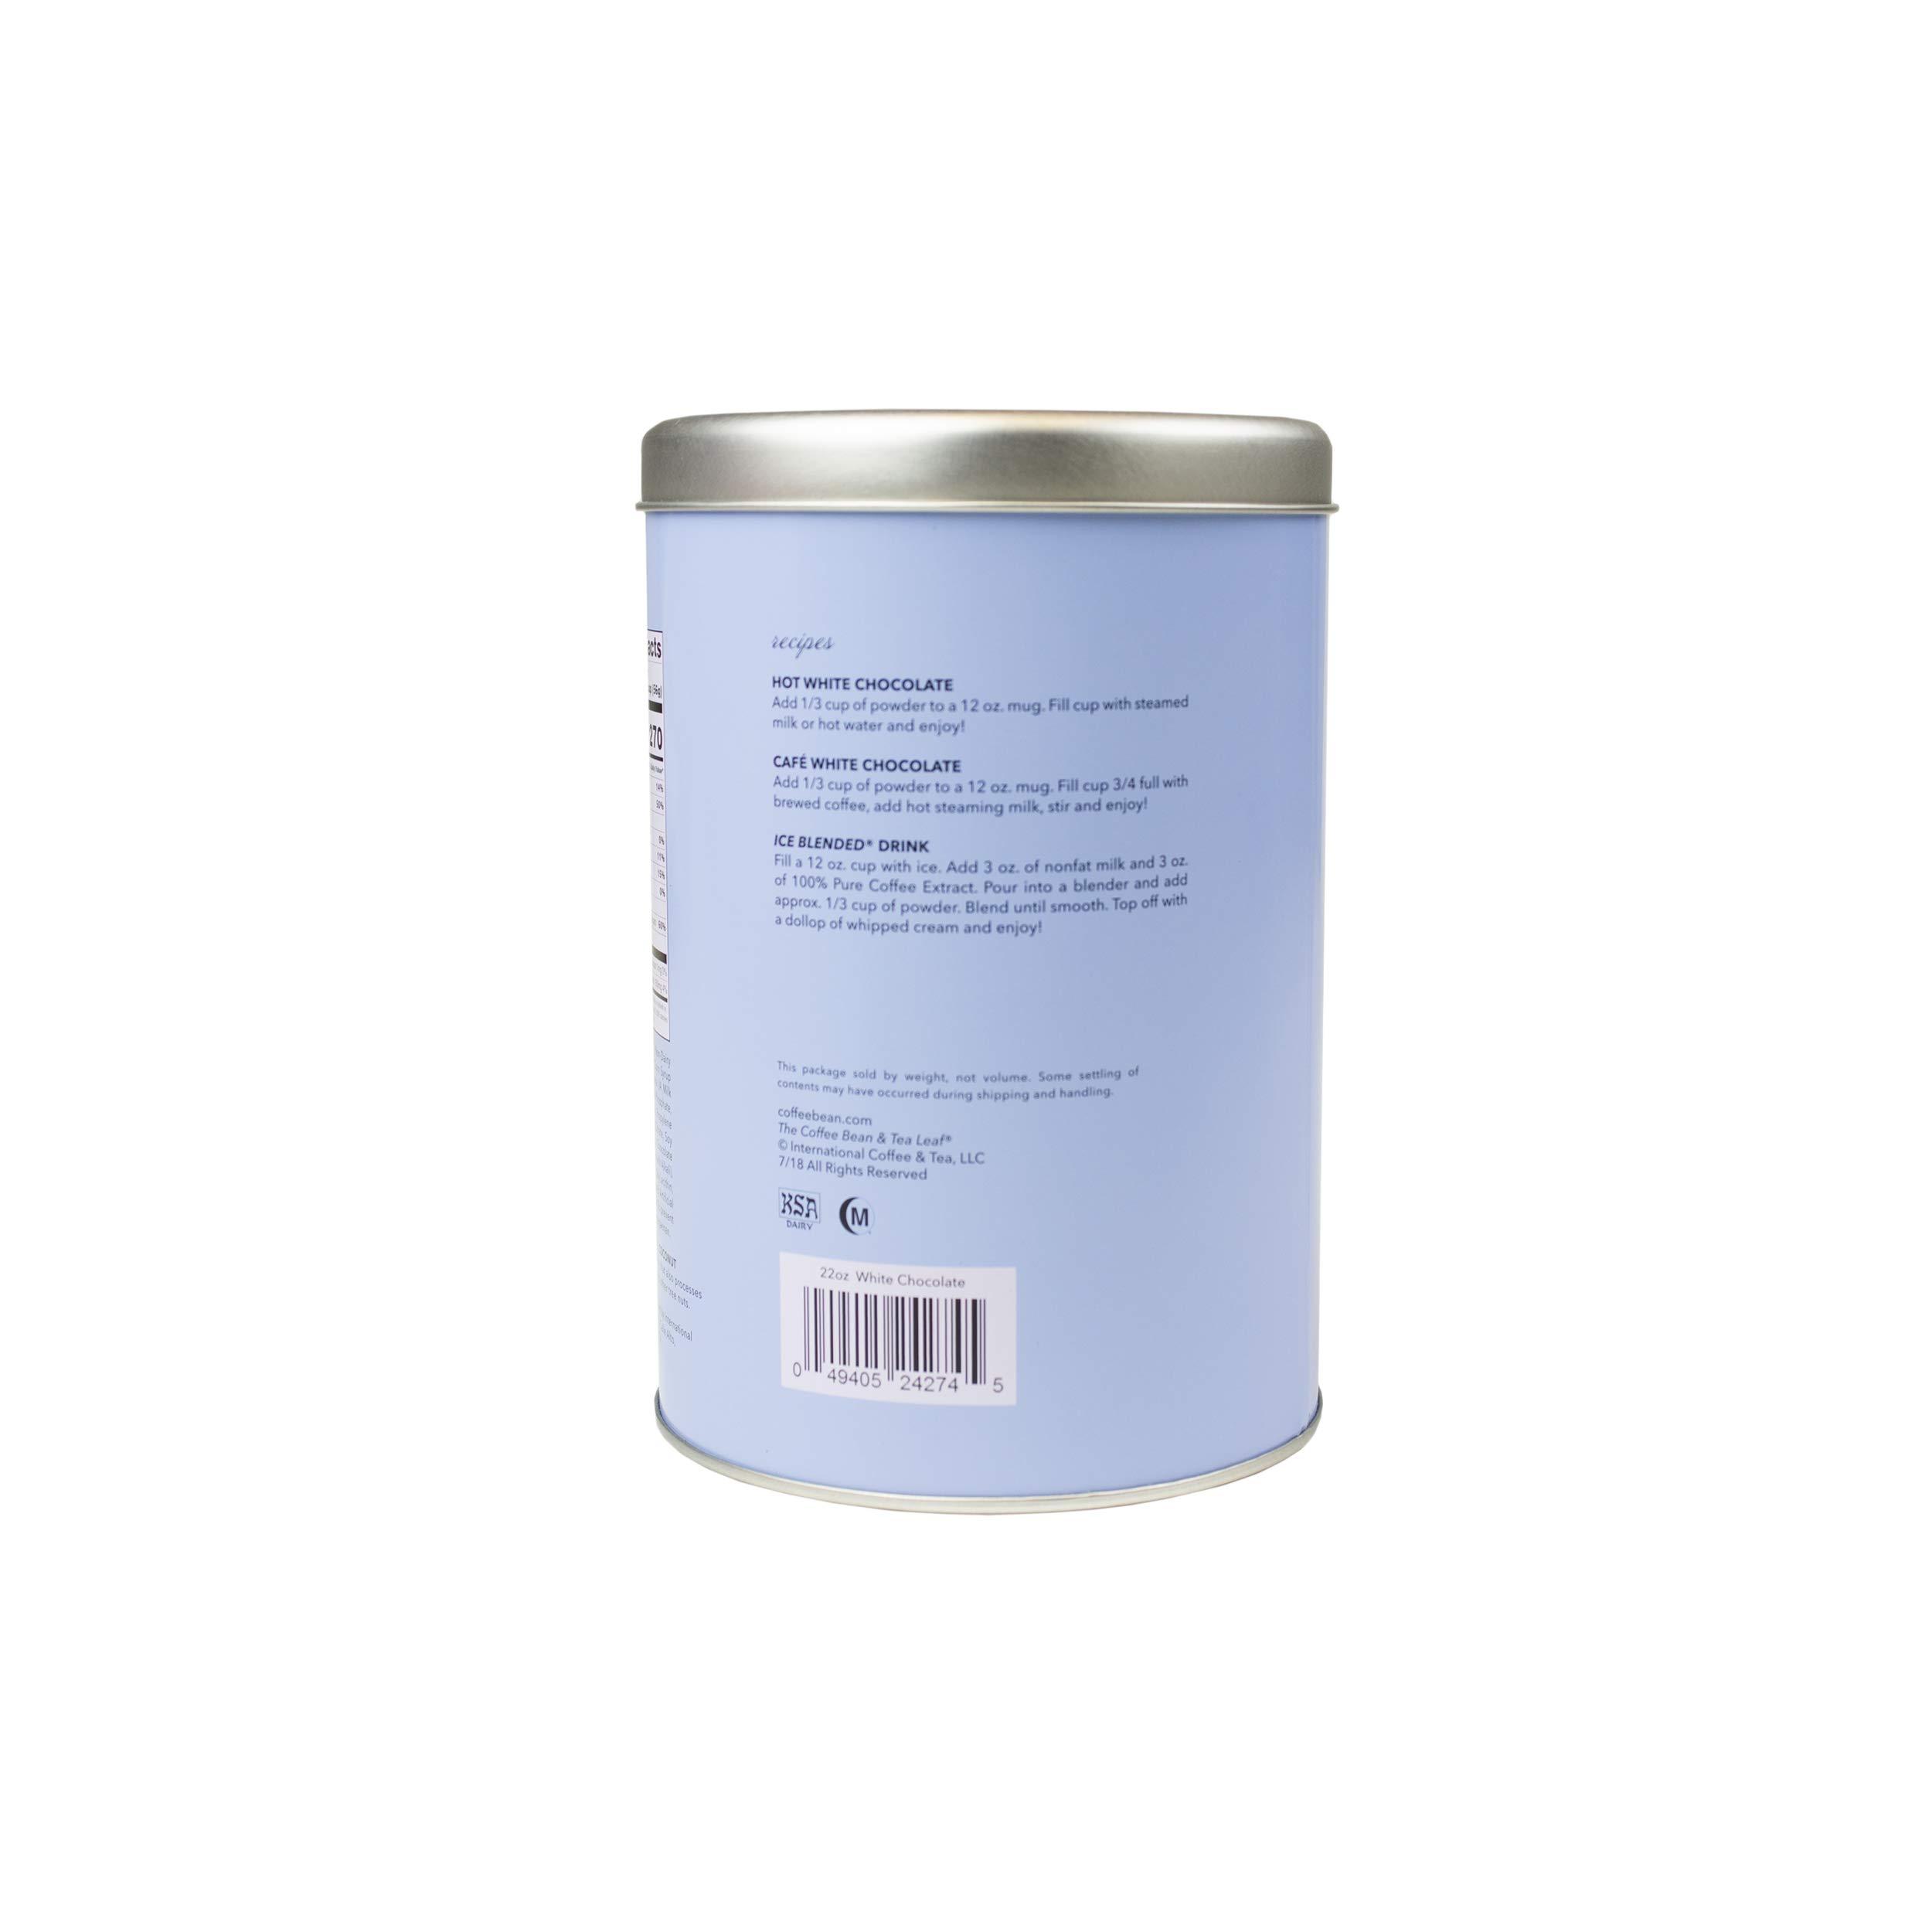 The Coffee Bean & Tea Leaf White Chocolate Powder, 22-Ounce Container by Coffee Bean & Tea Leaf (Image #3)